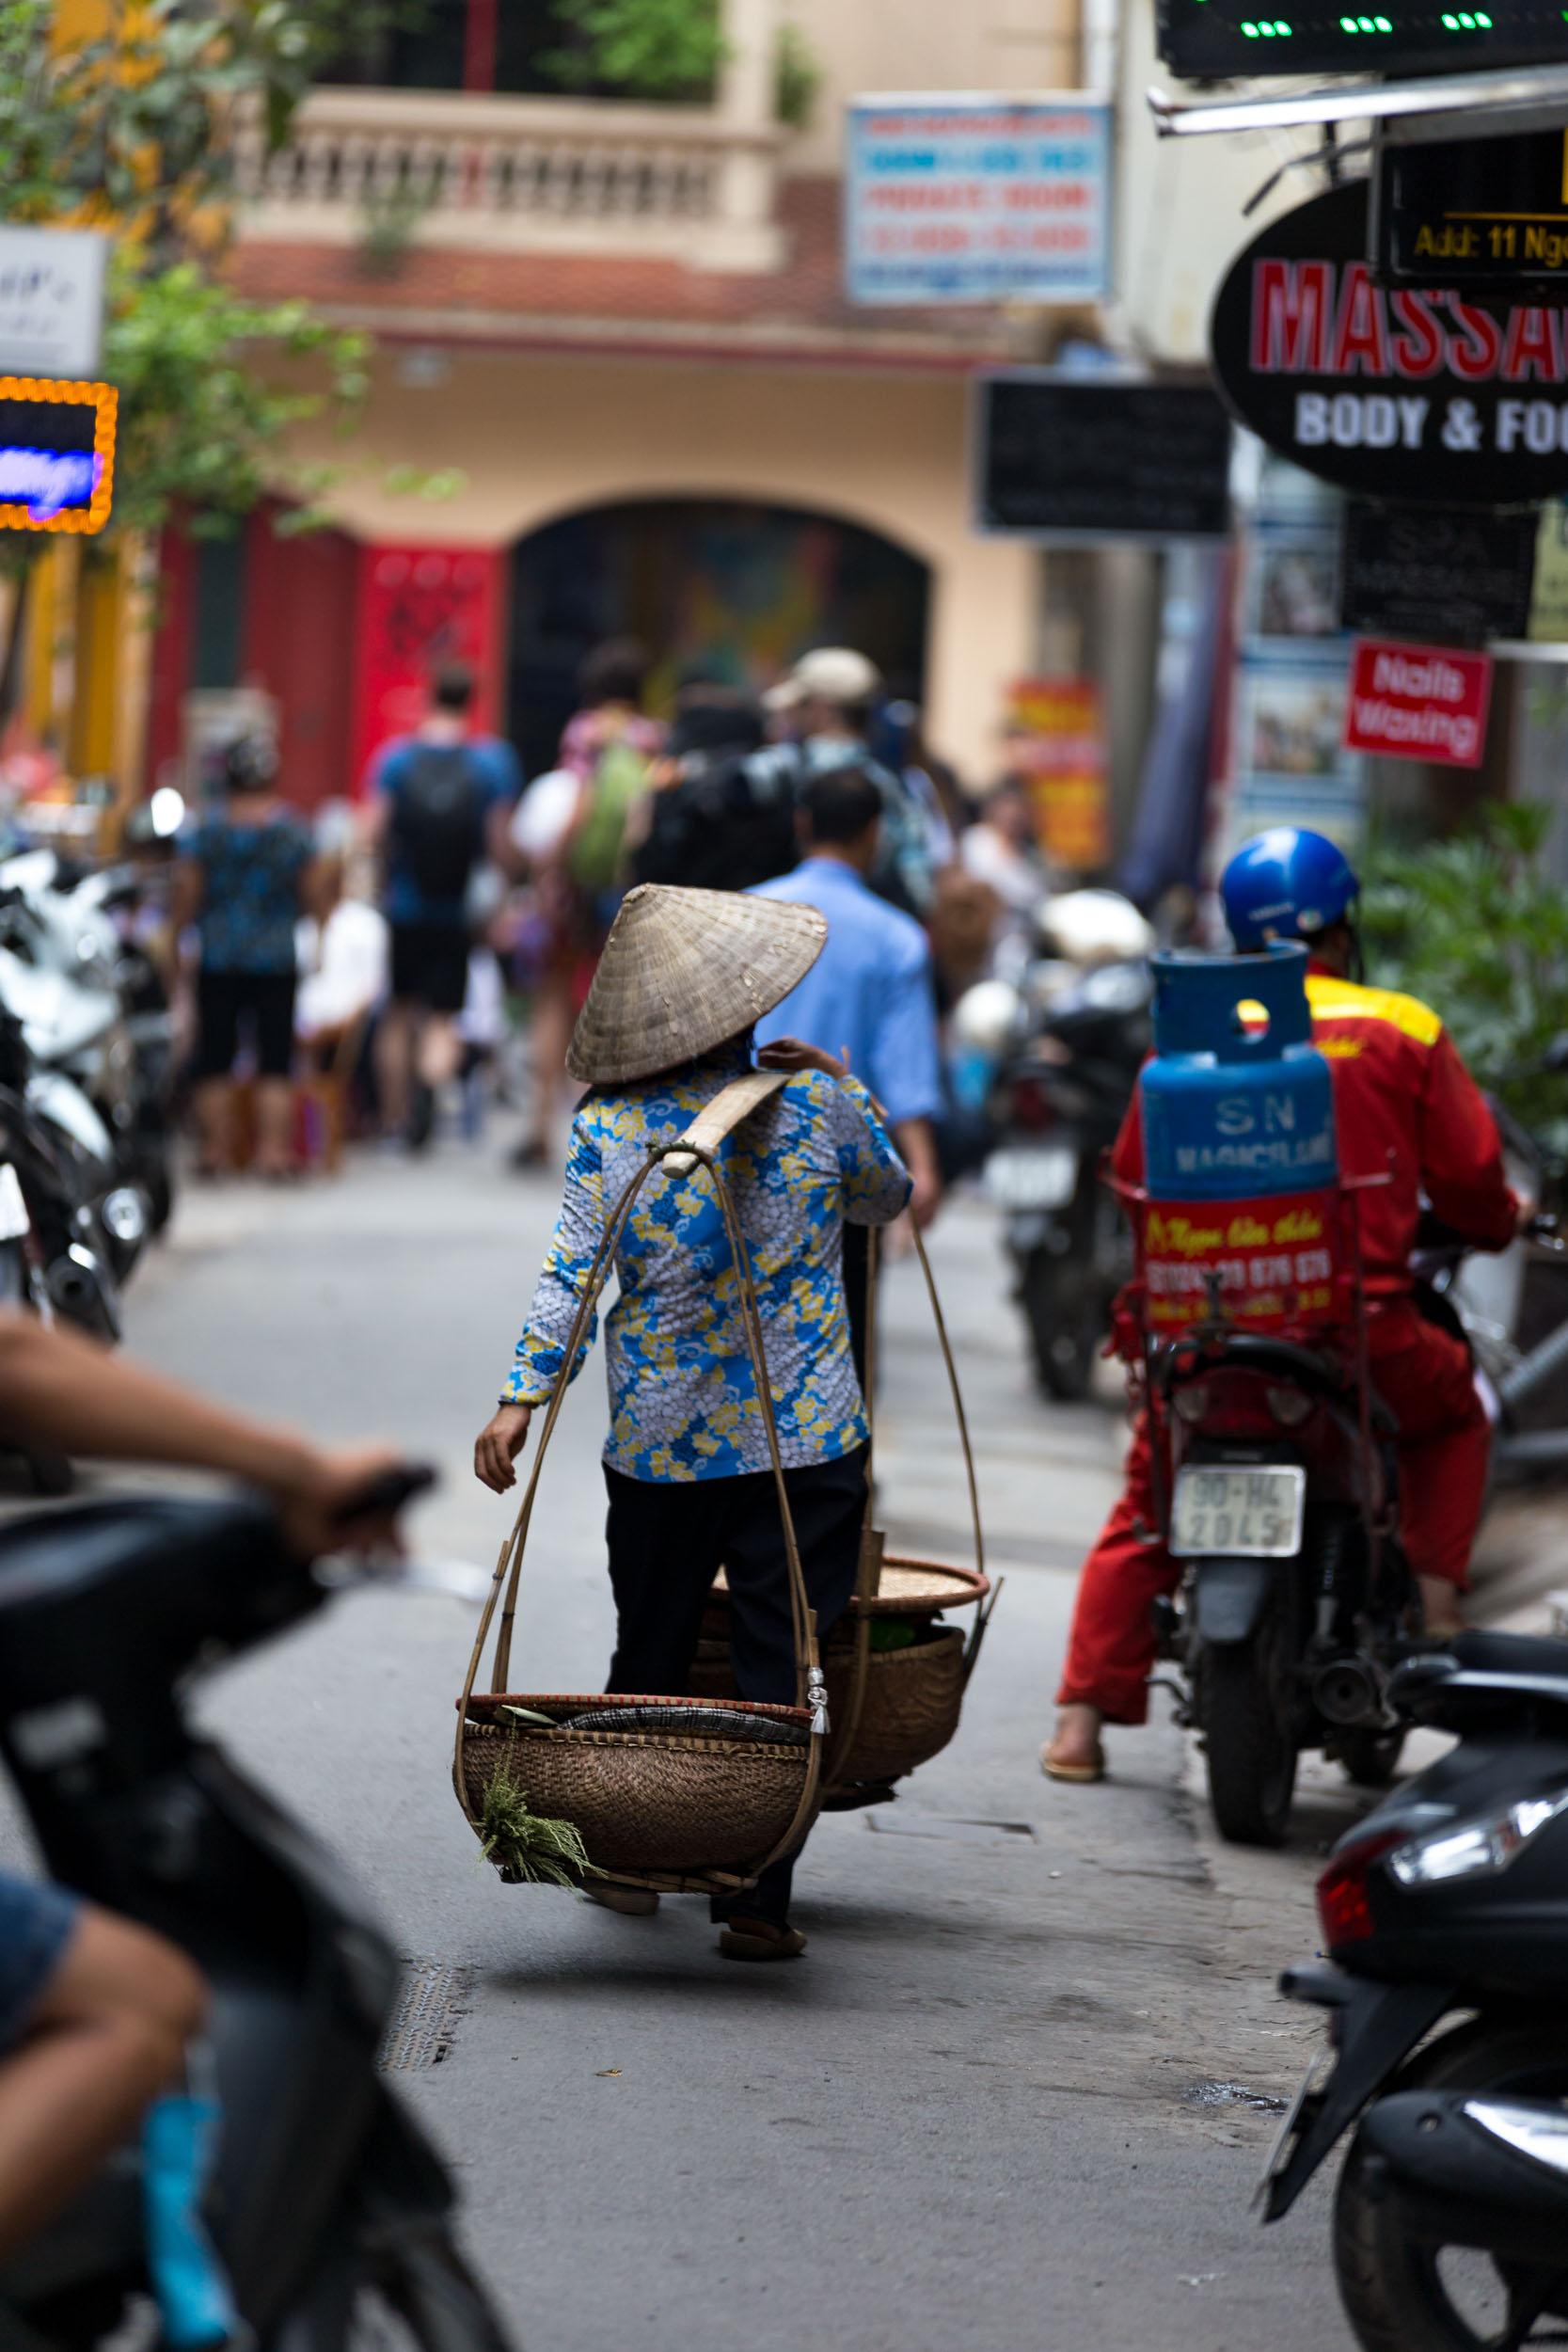 Local trade girl carries 2 baskets on shoulder rig on Hgo Huyen, Hanoi.